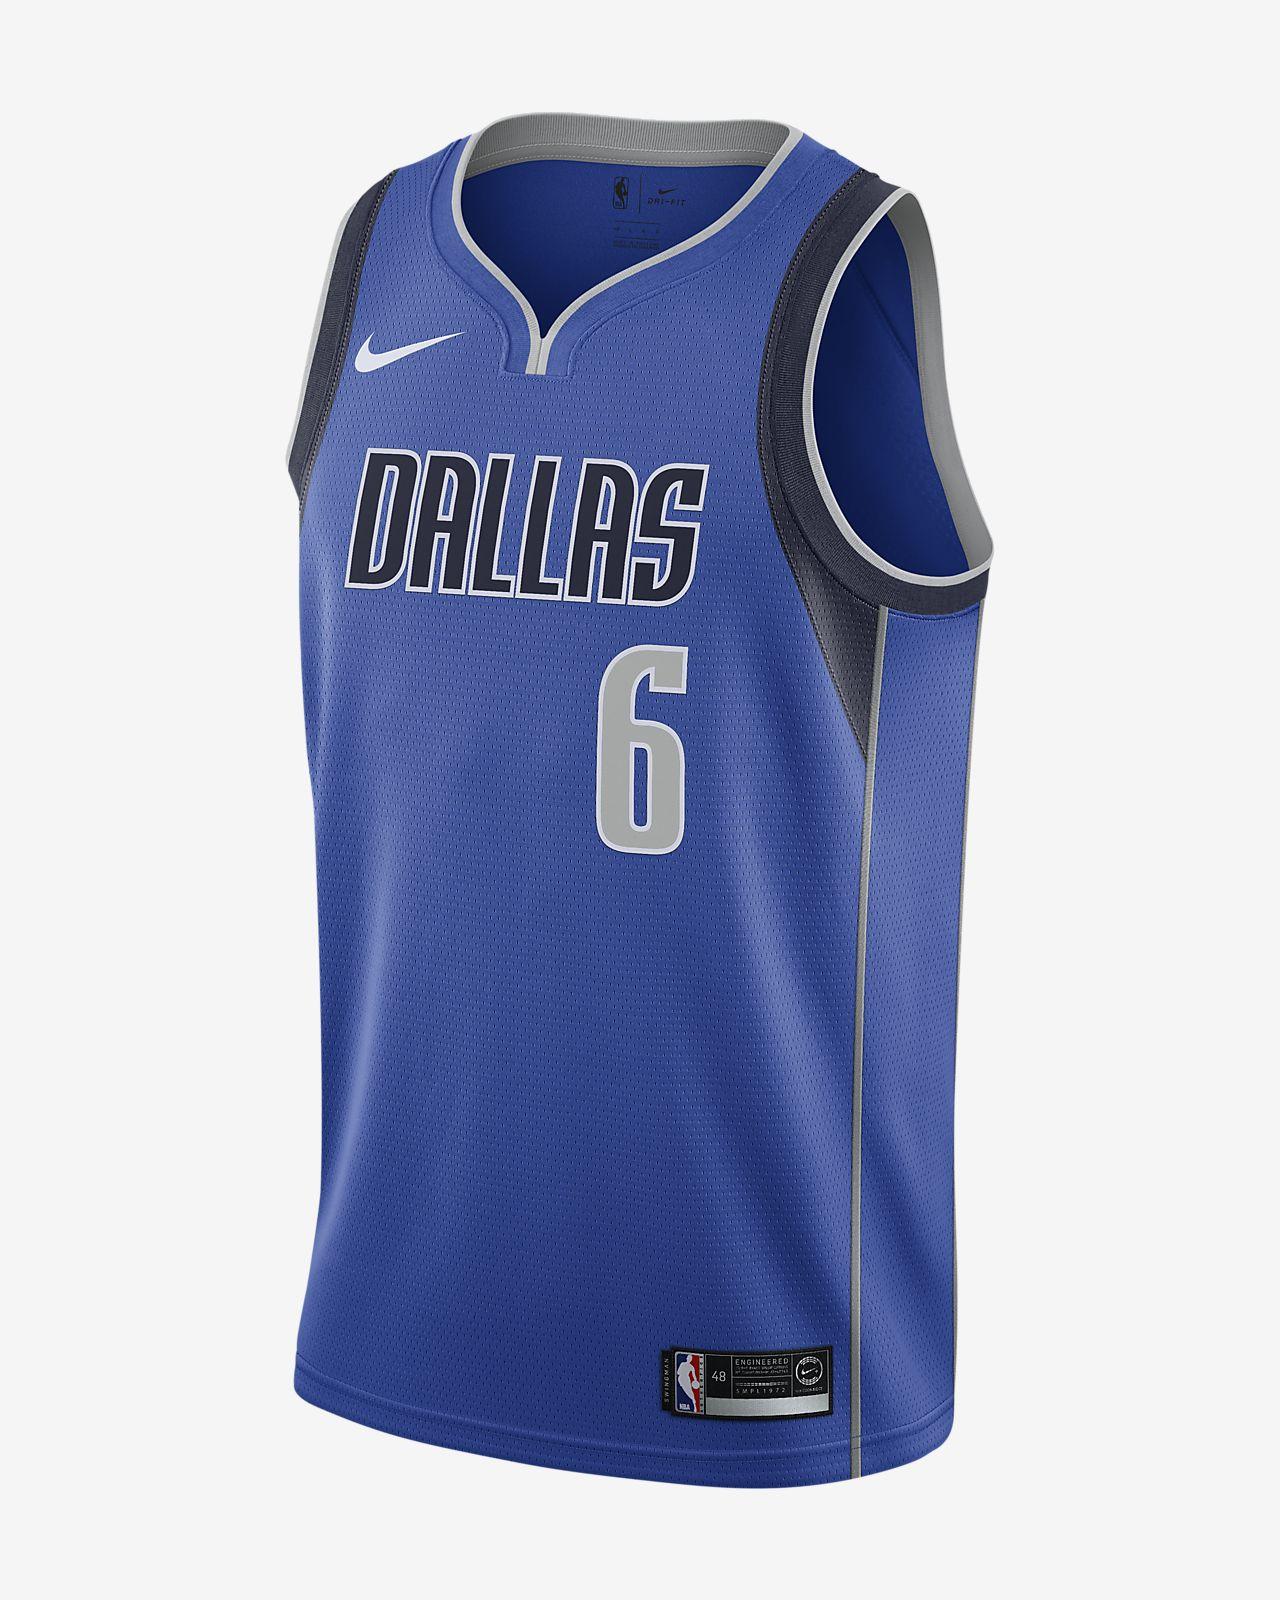 Koszulka Nike NBA Swingman DeAndre Jordan Mavericks Icon Edition